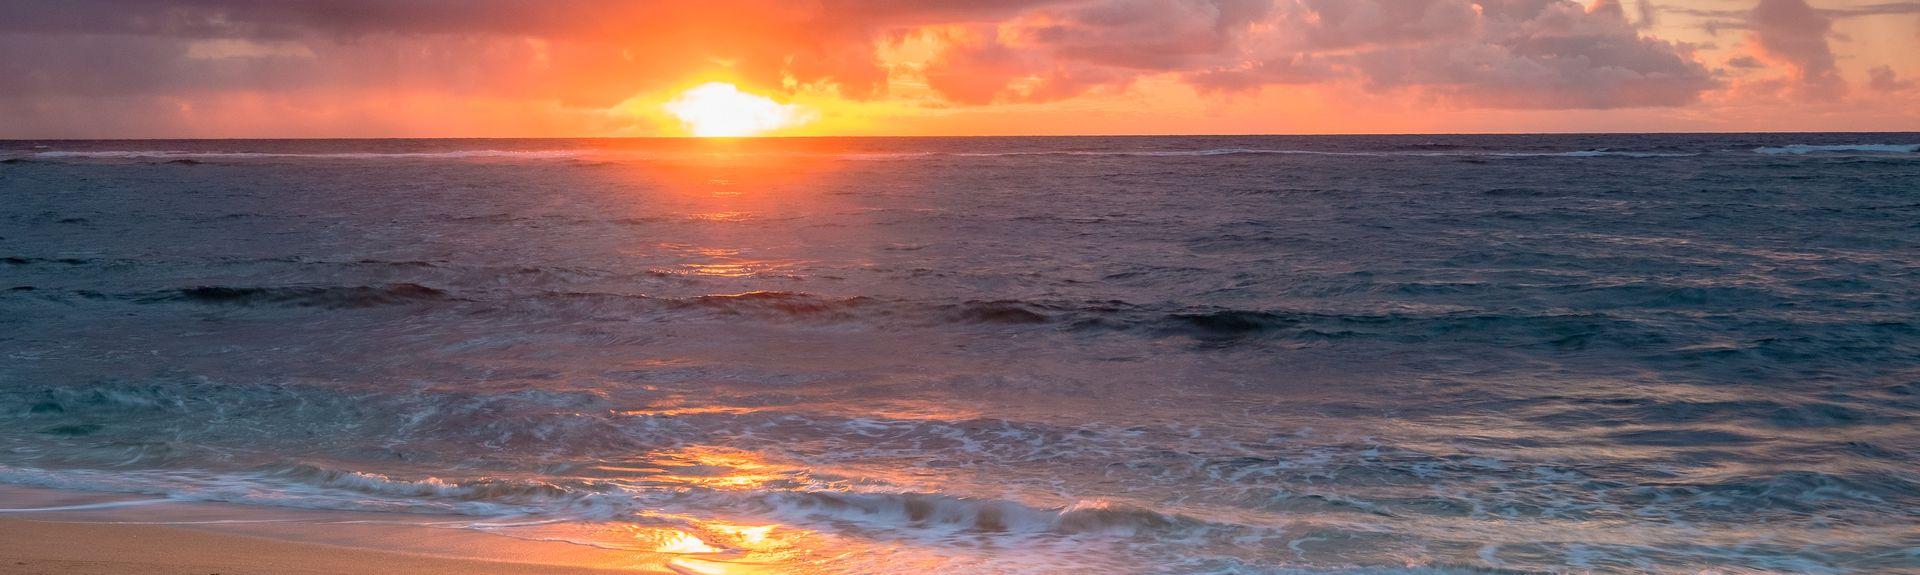 Hanamaulu, Hawaii, United States